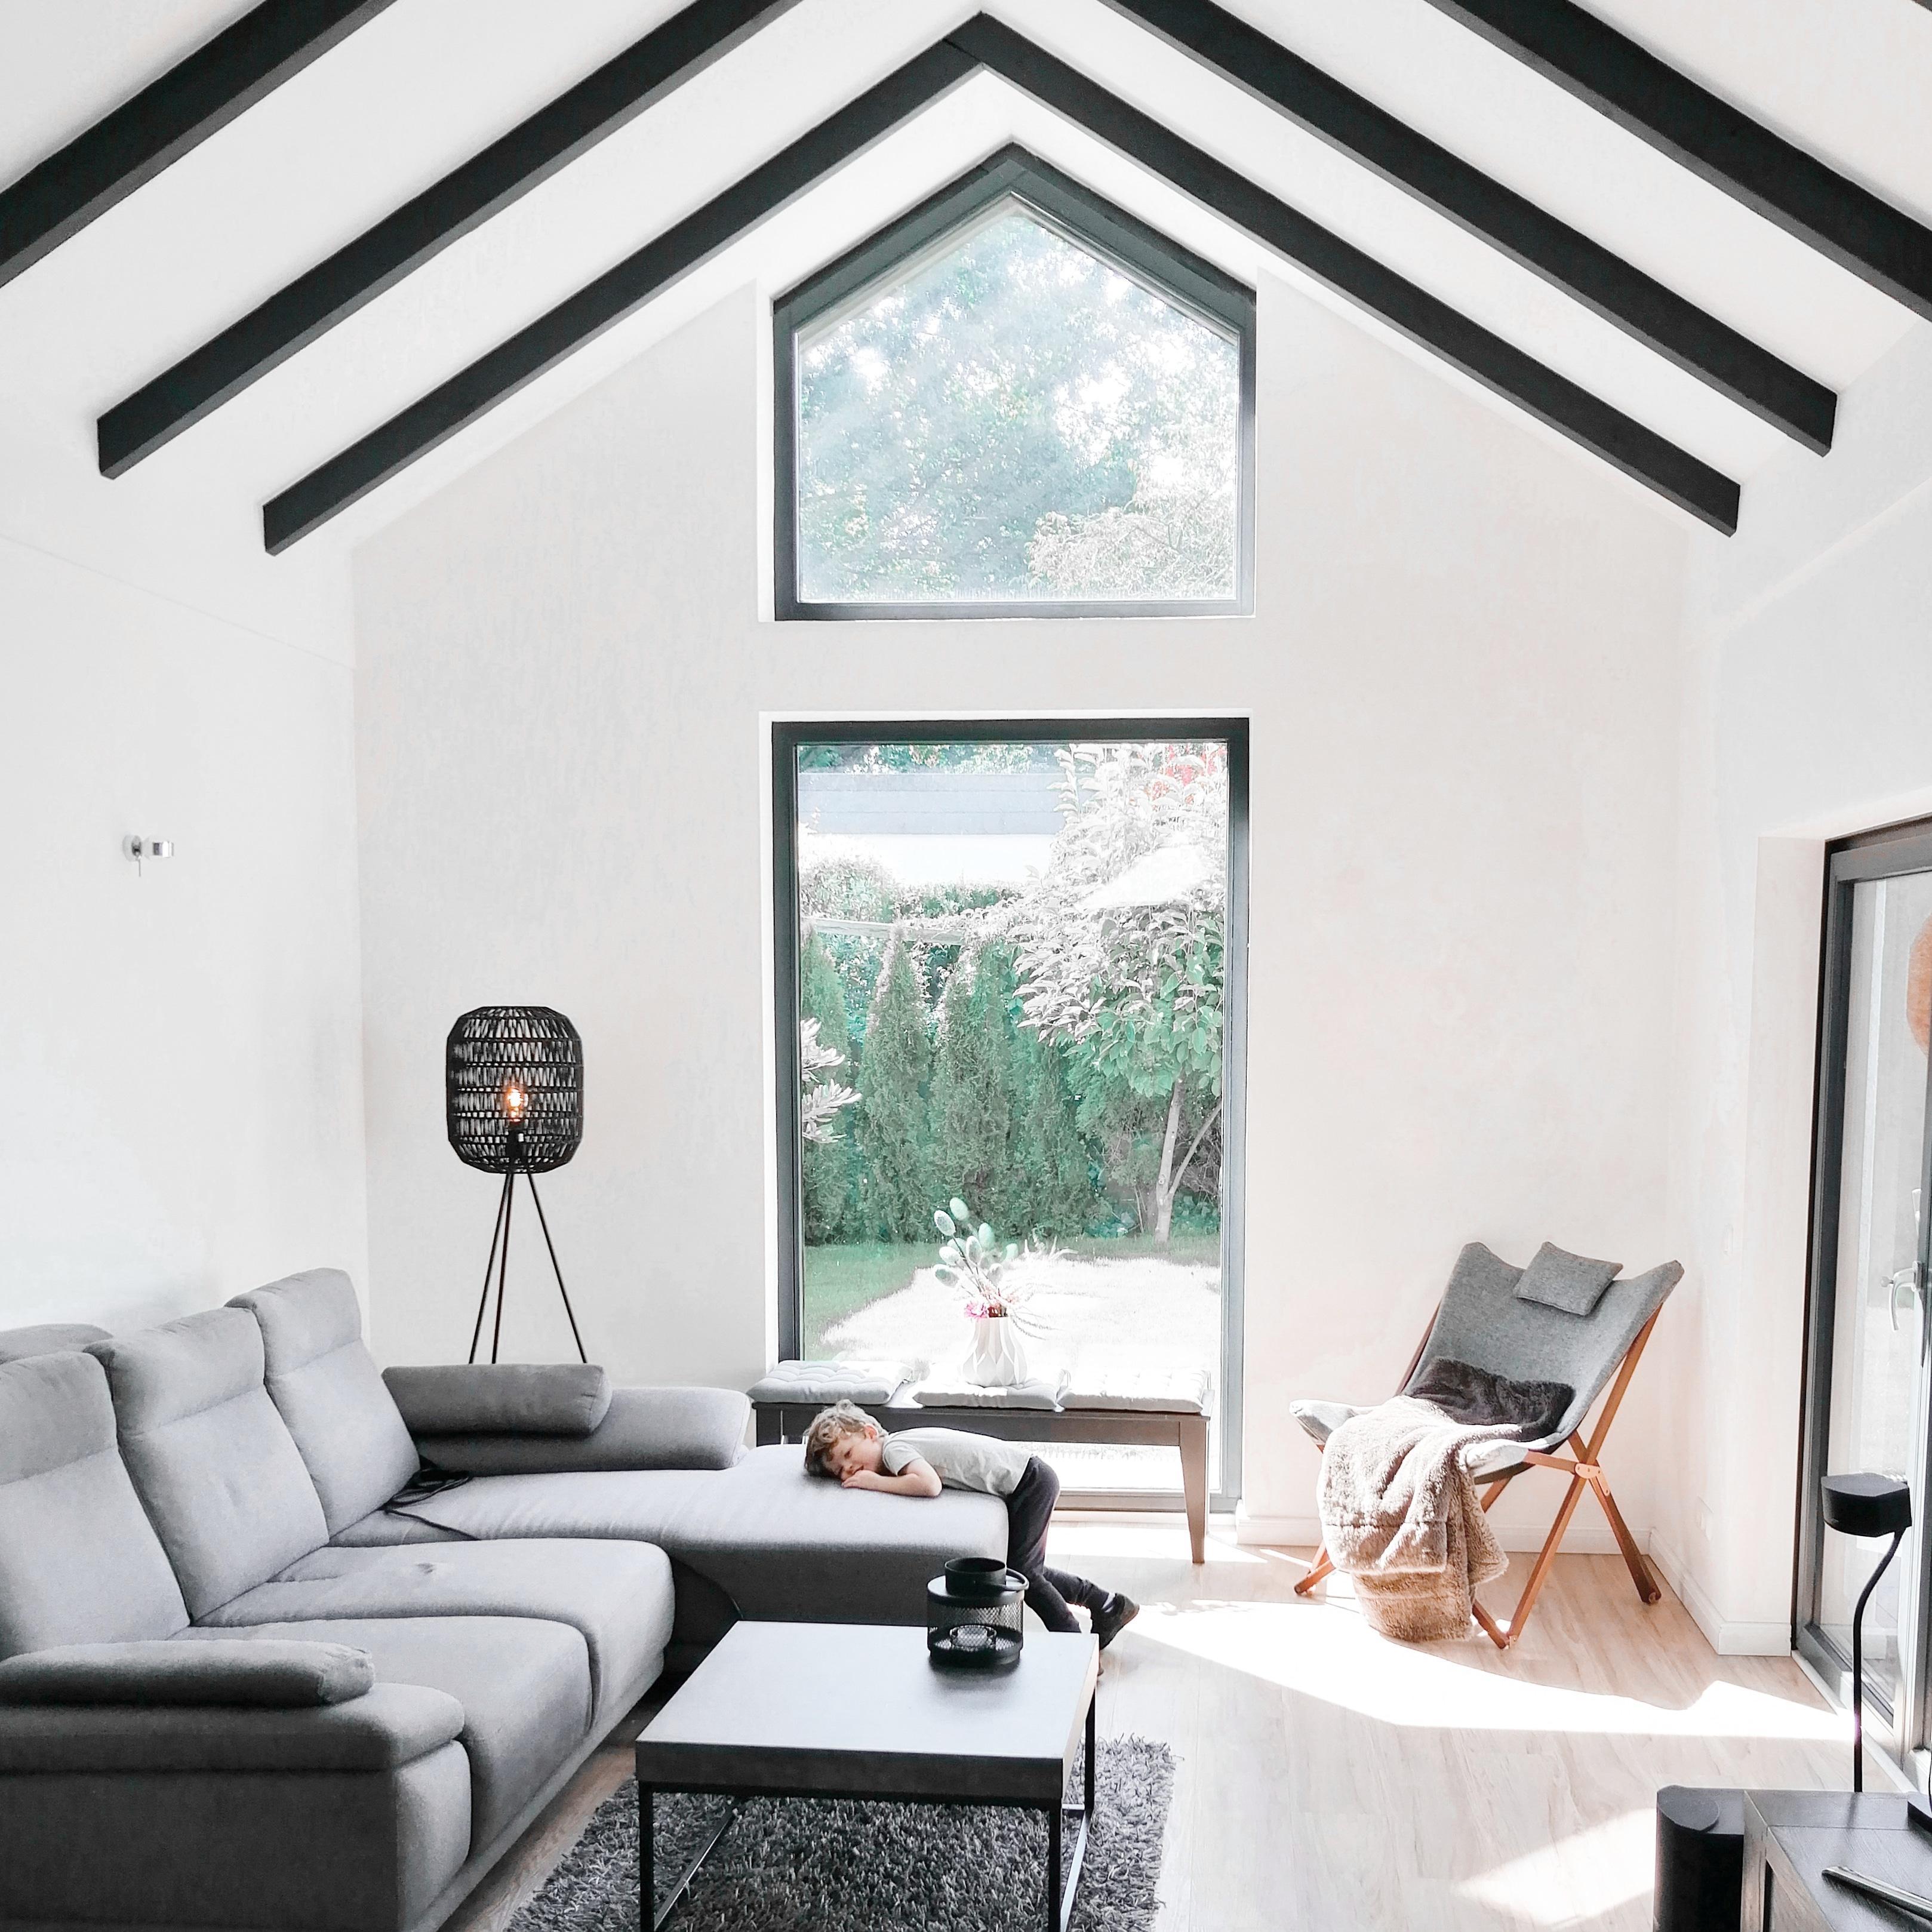 Balken Bilder Ideen Couch